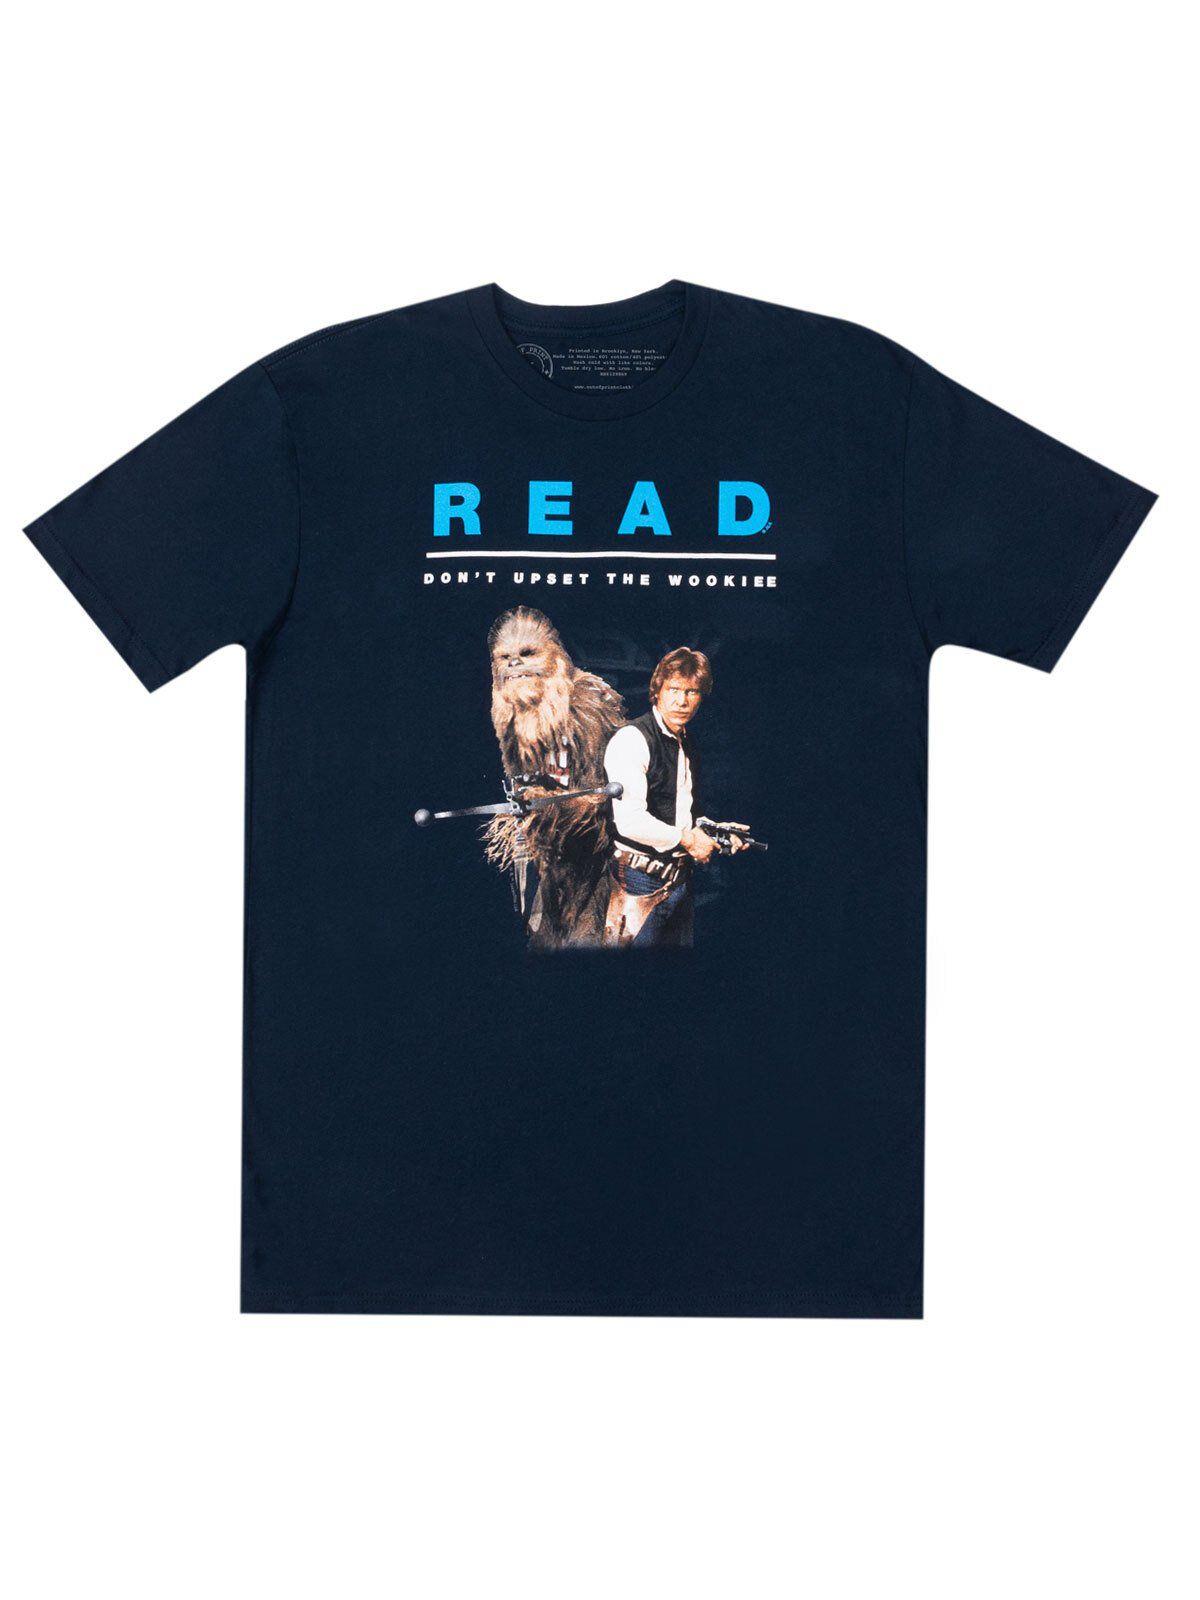 https://outofprint.com/products/star-wars-han-solo-chewbacca-read-unisex-t-shirt?utm_source=google&utm_medium=cpc&utm_term=&utm_campaign=g-US-smartshopping&utm_content=309924858691&gclid=EAIaIQobChMIq4-My4Sx6QIVPYpaBR1FlAxwEAQYASABEgIxQvD_BwE